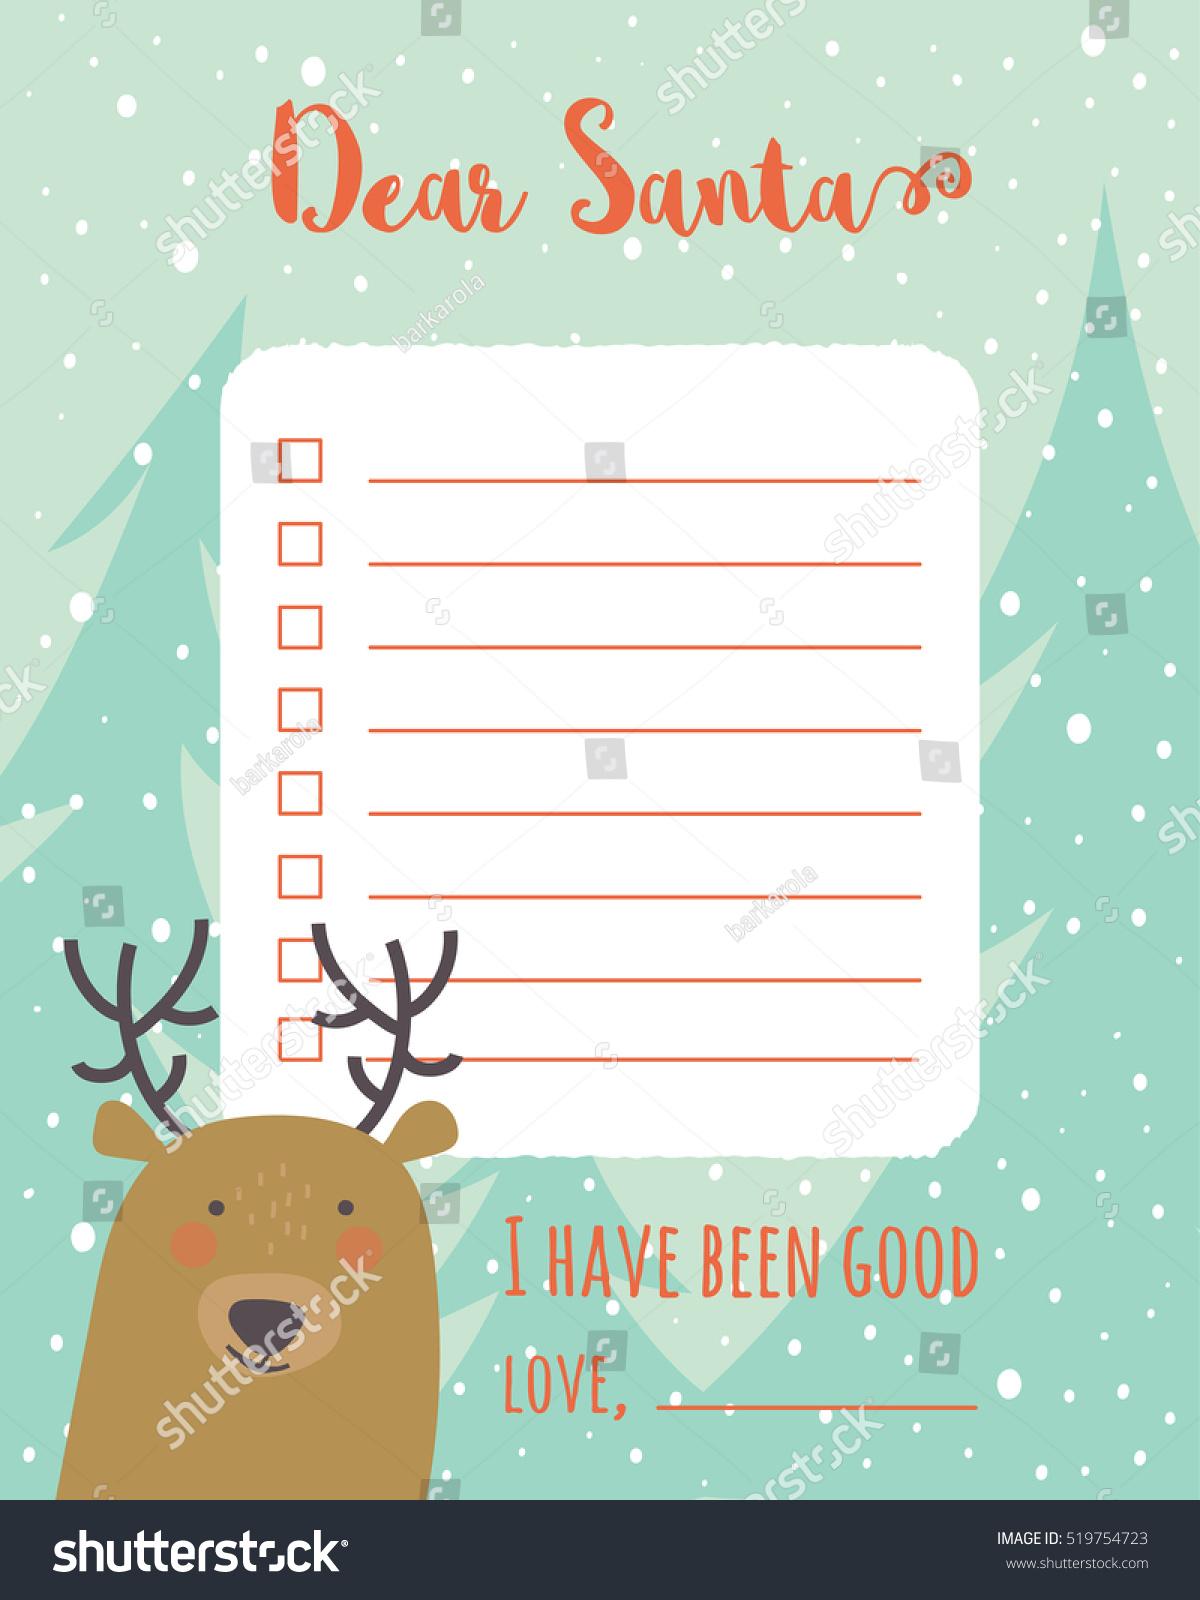 Cartoon Christmas Wish List Christmas Trees Stock Photo (Photo ...